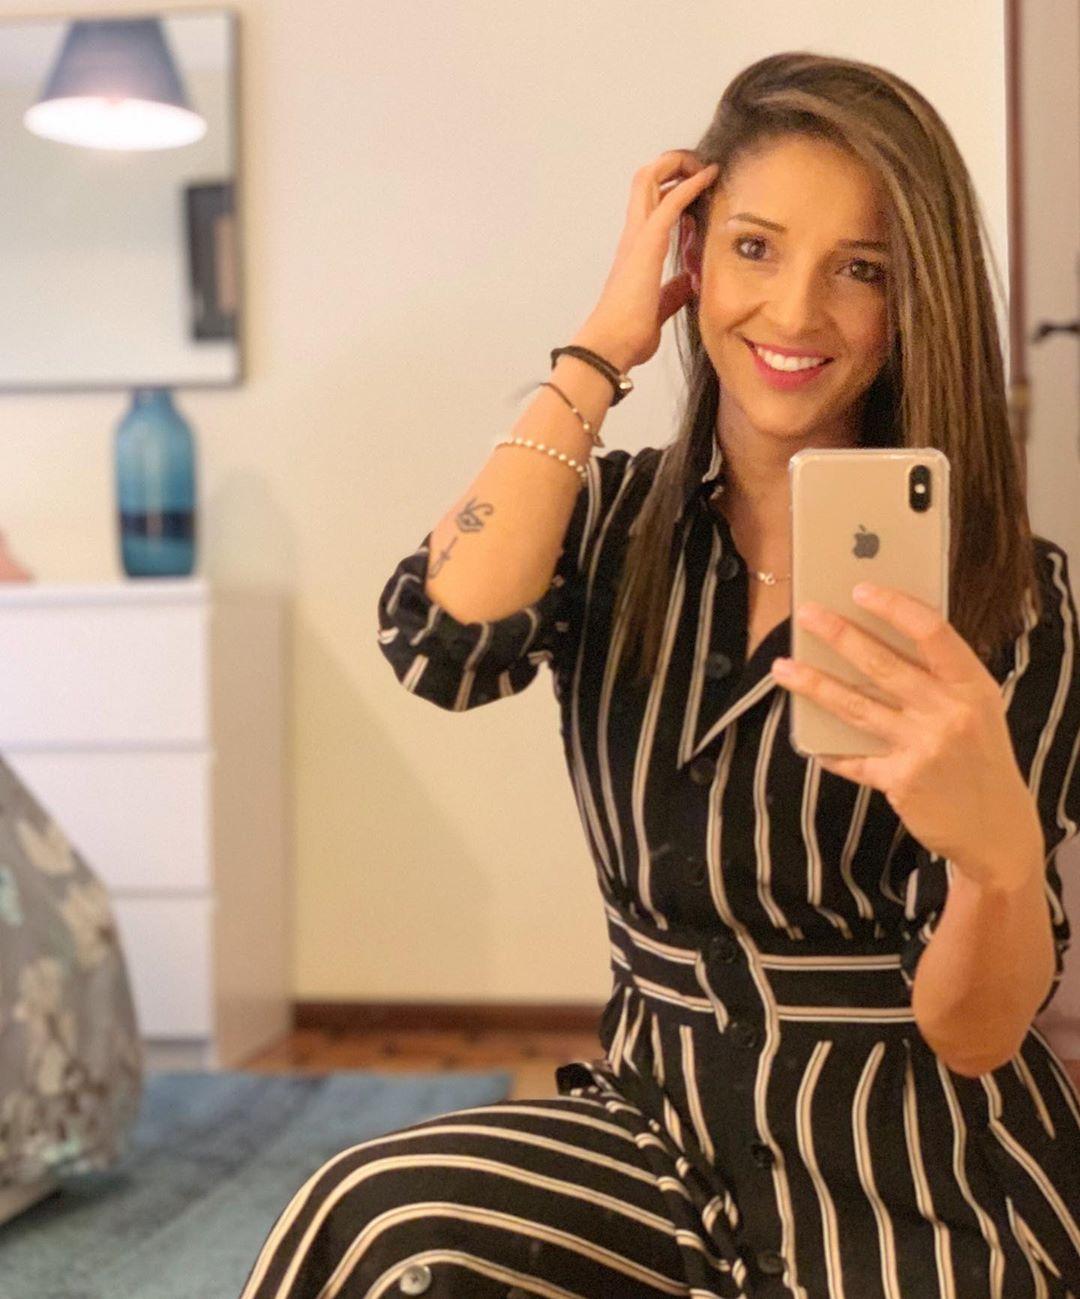 striped dress flaps de Massimo Dutti sur lipinha_gomez